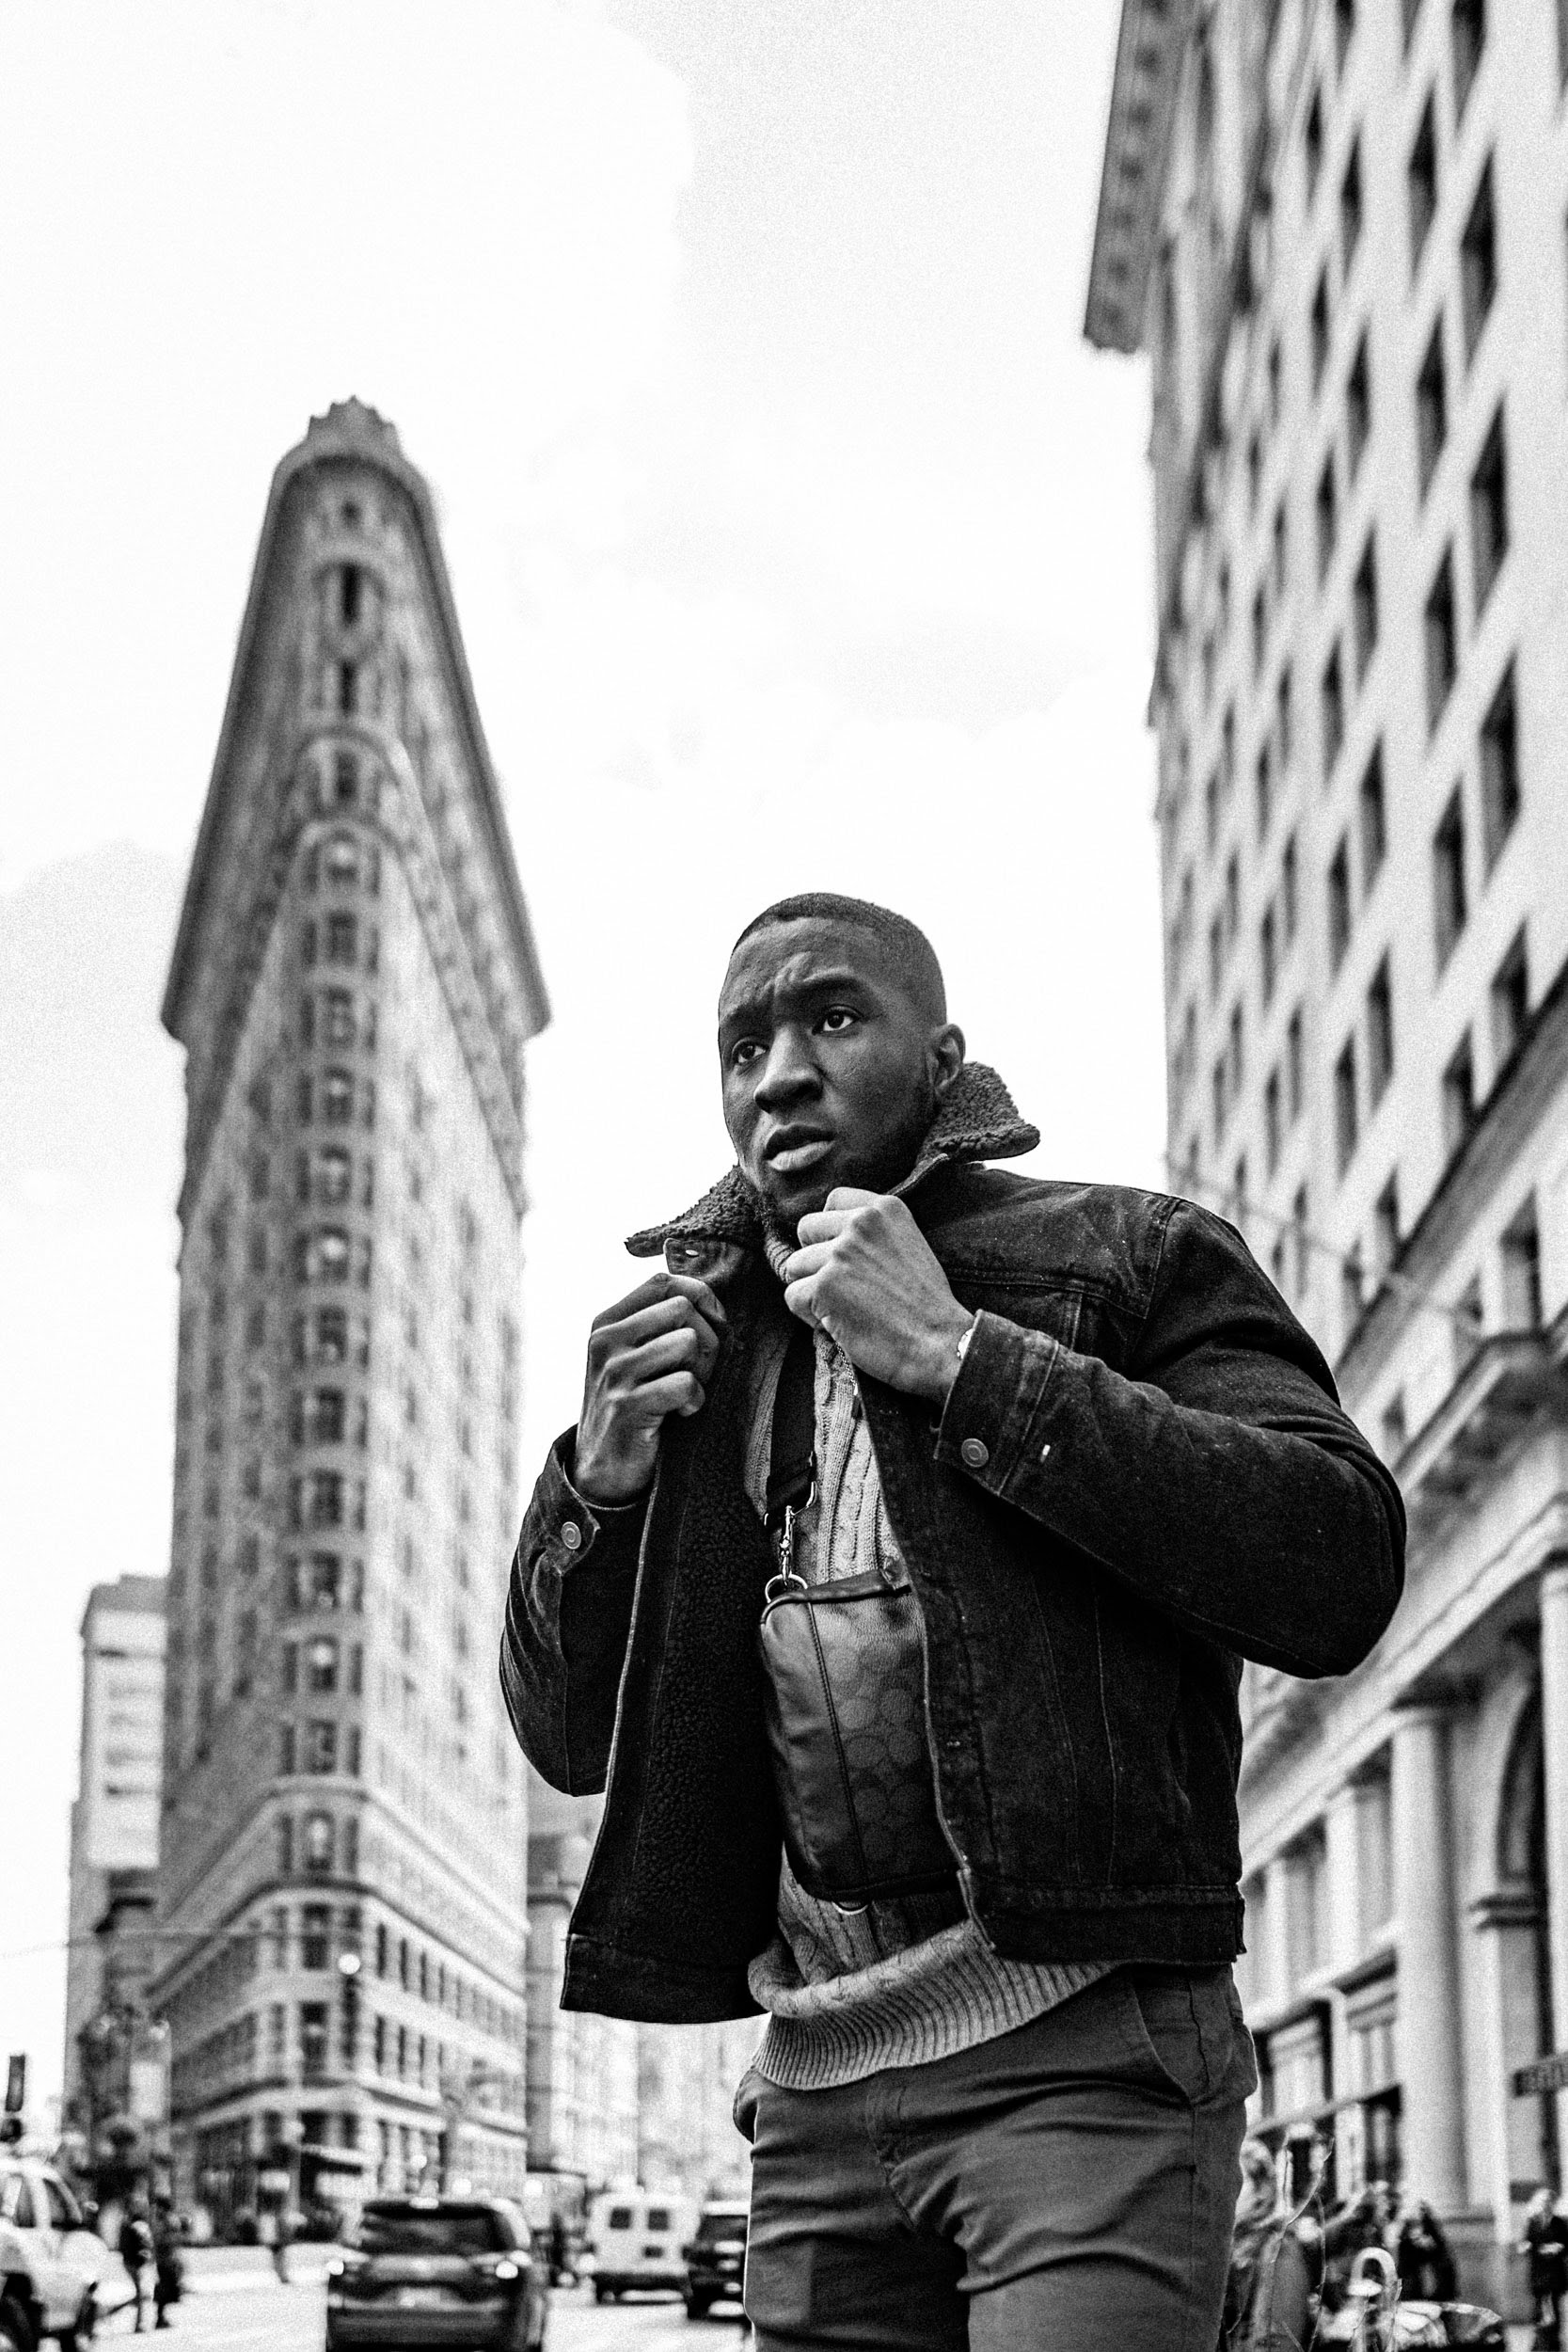 Daryl Wilson - Model in NYC - Flatiron